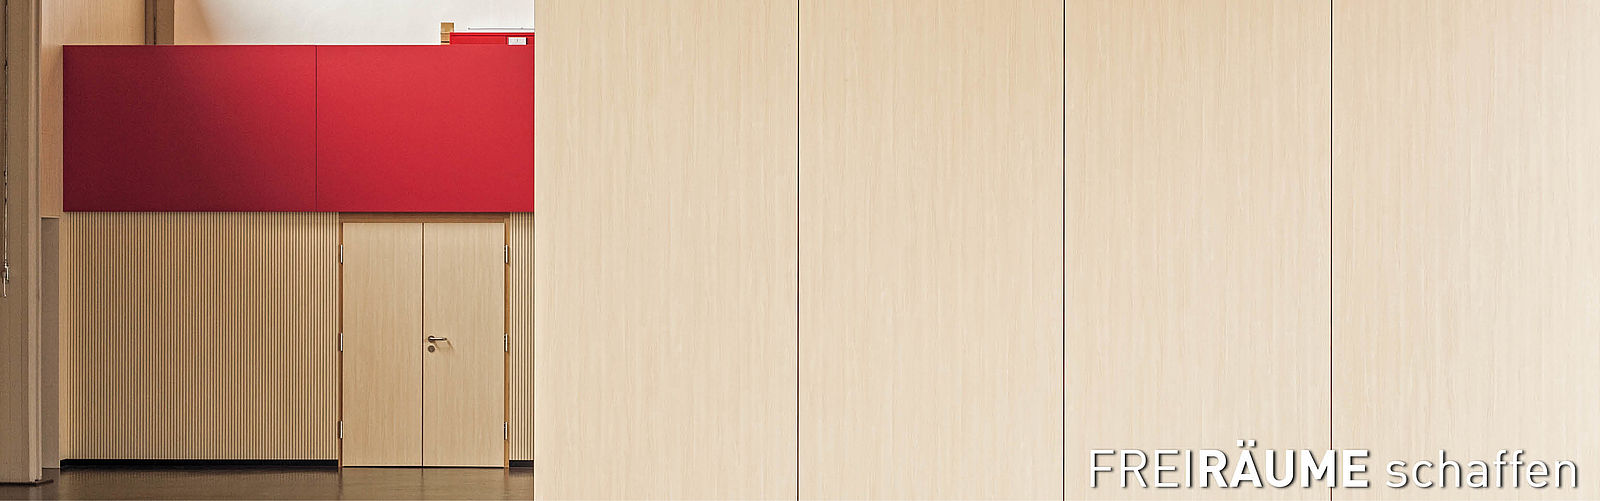 hallenb ros meisterb ros trennwandsysteme lagerb hnen. Black Bedroom Furniture Sets. Home Design Ideas